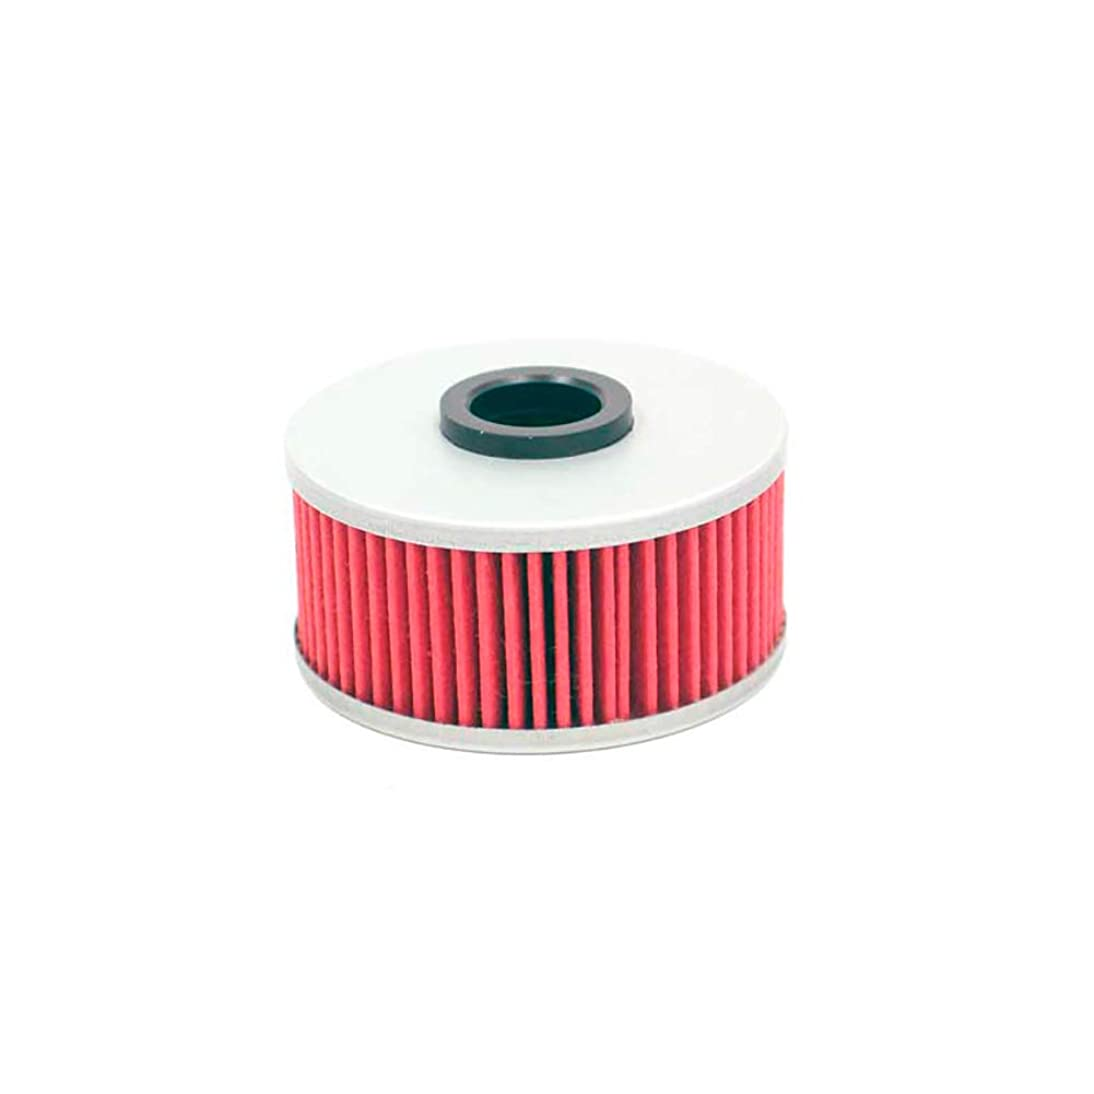 K&N KN-145 Powersports High Performance Oil Filter oqen957253217926